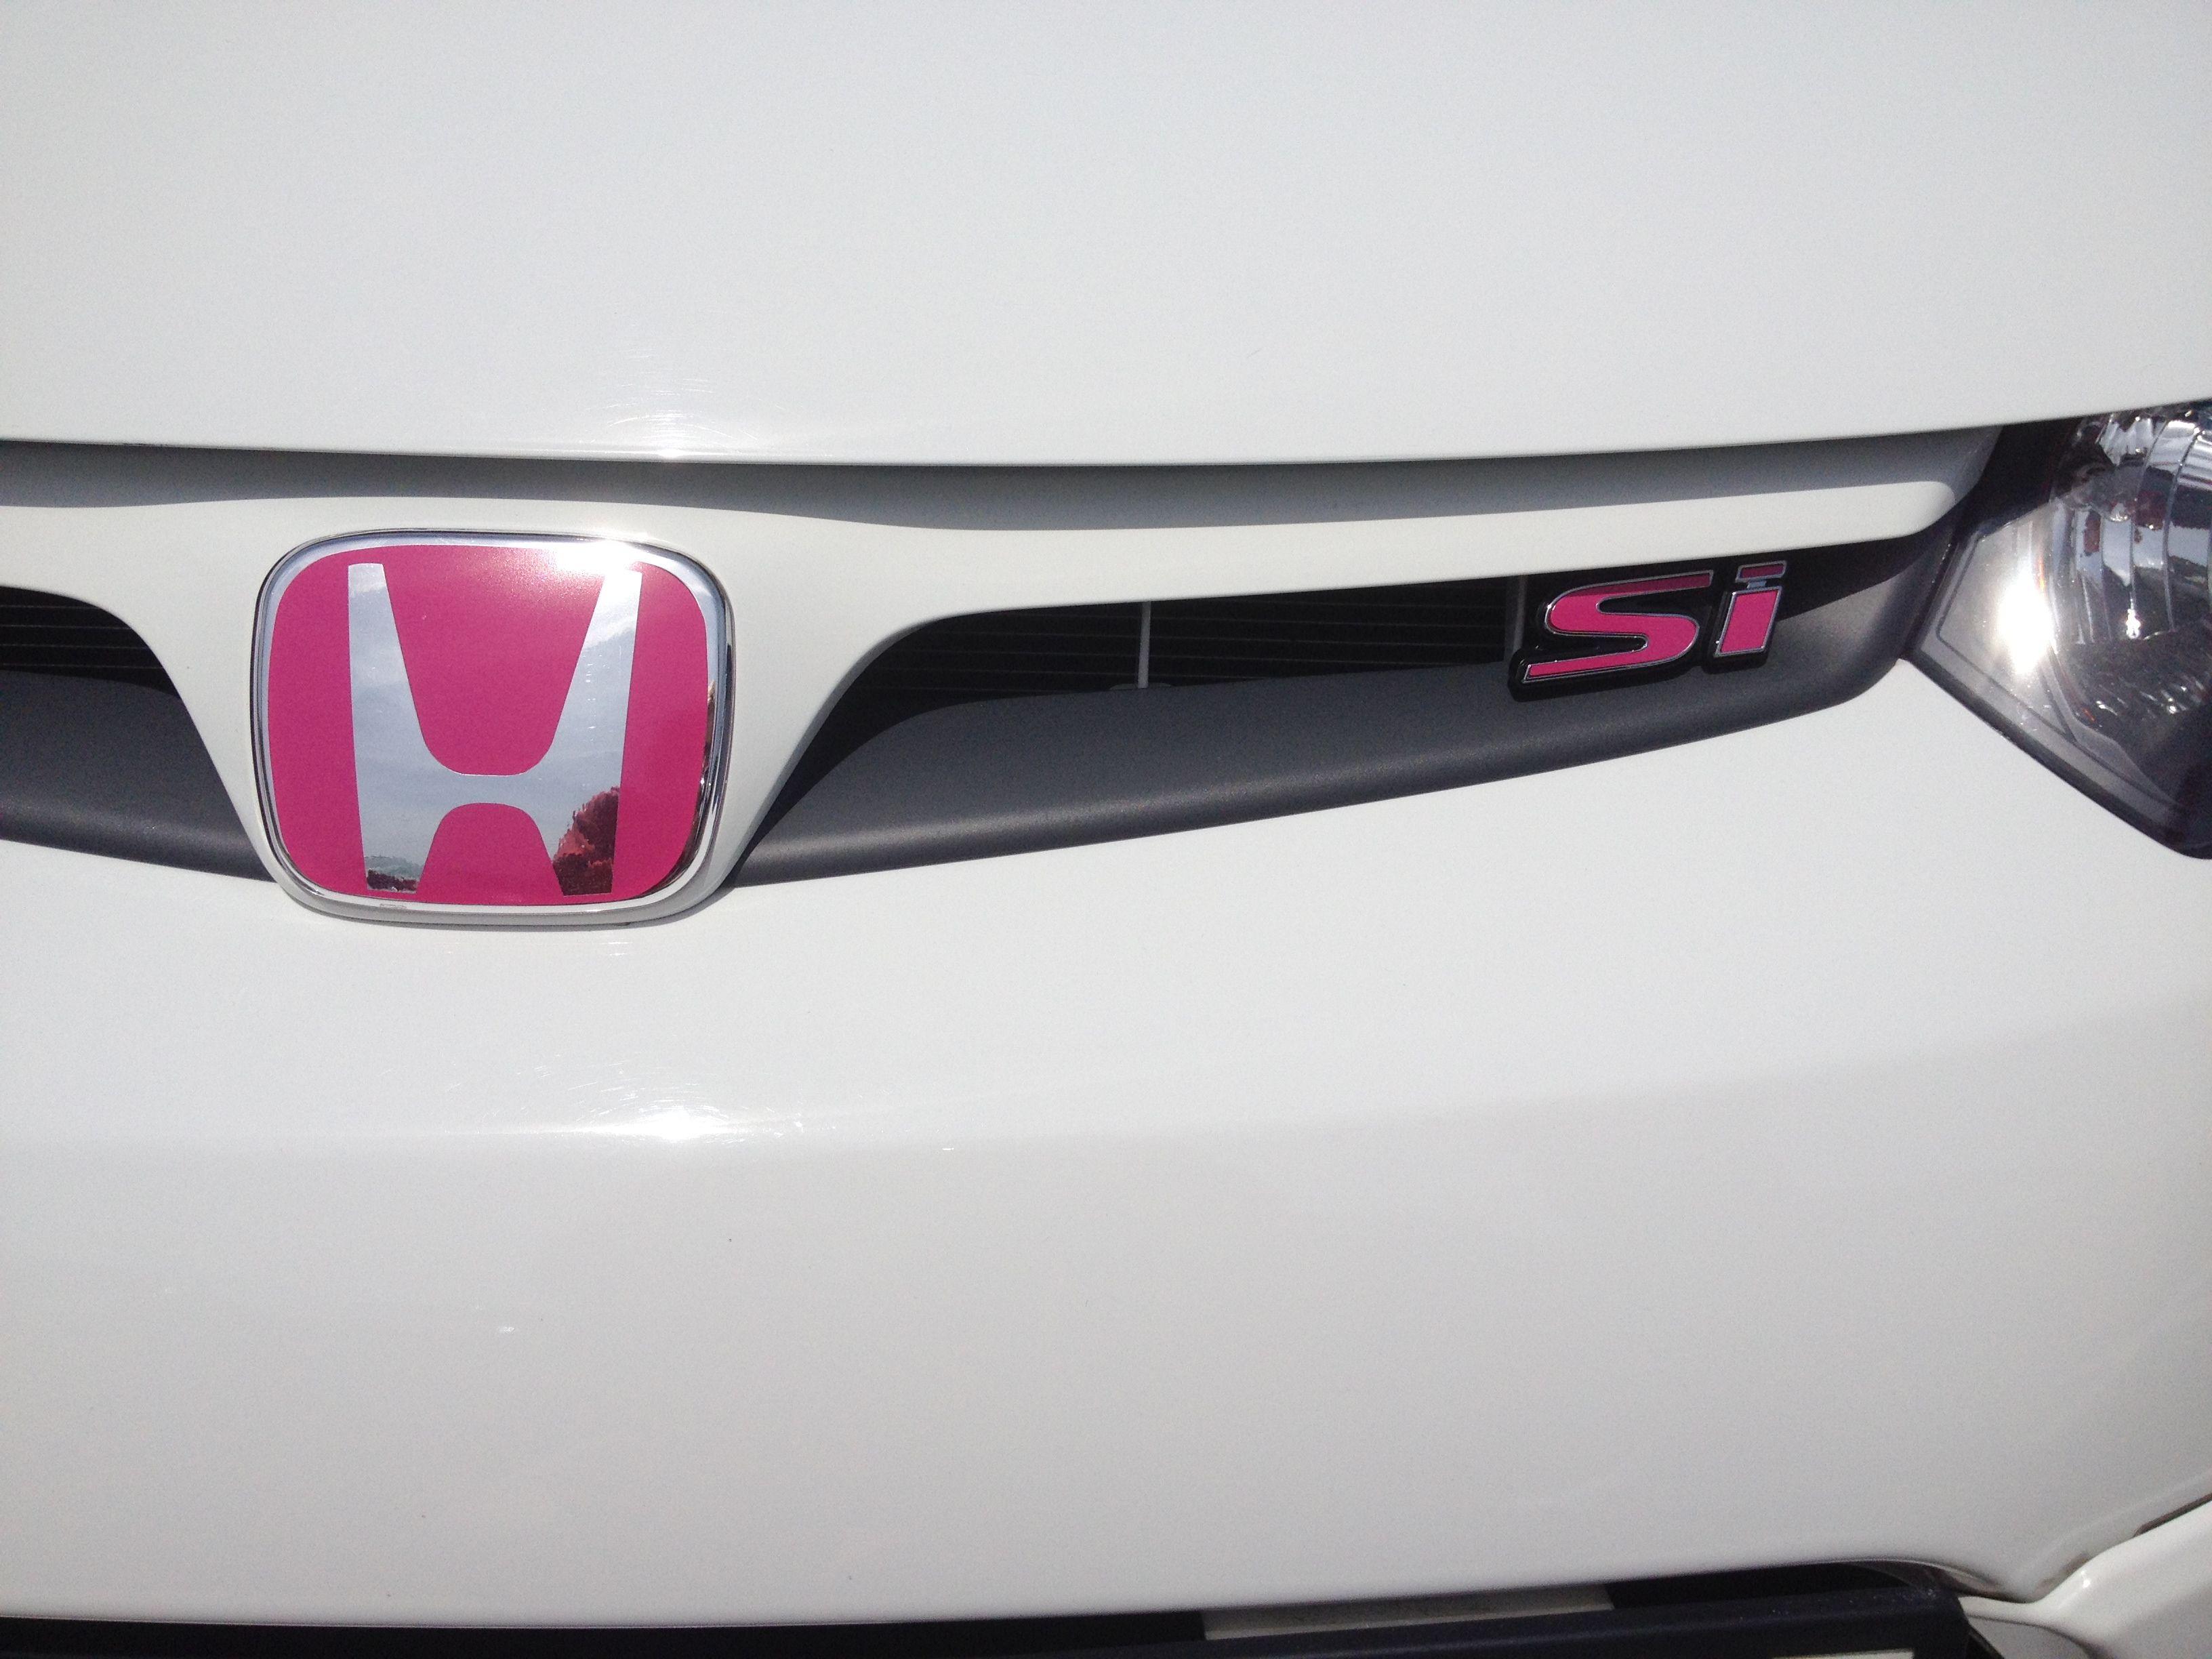 Pin By Lisbeth Henriksen On All Honda Honda Accord Honda Civic Sedan